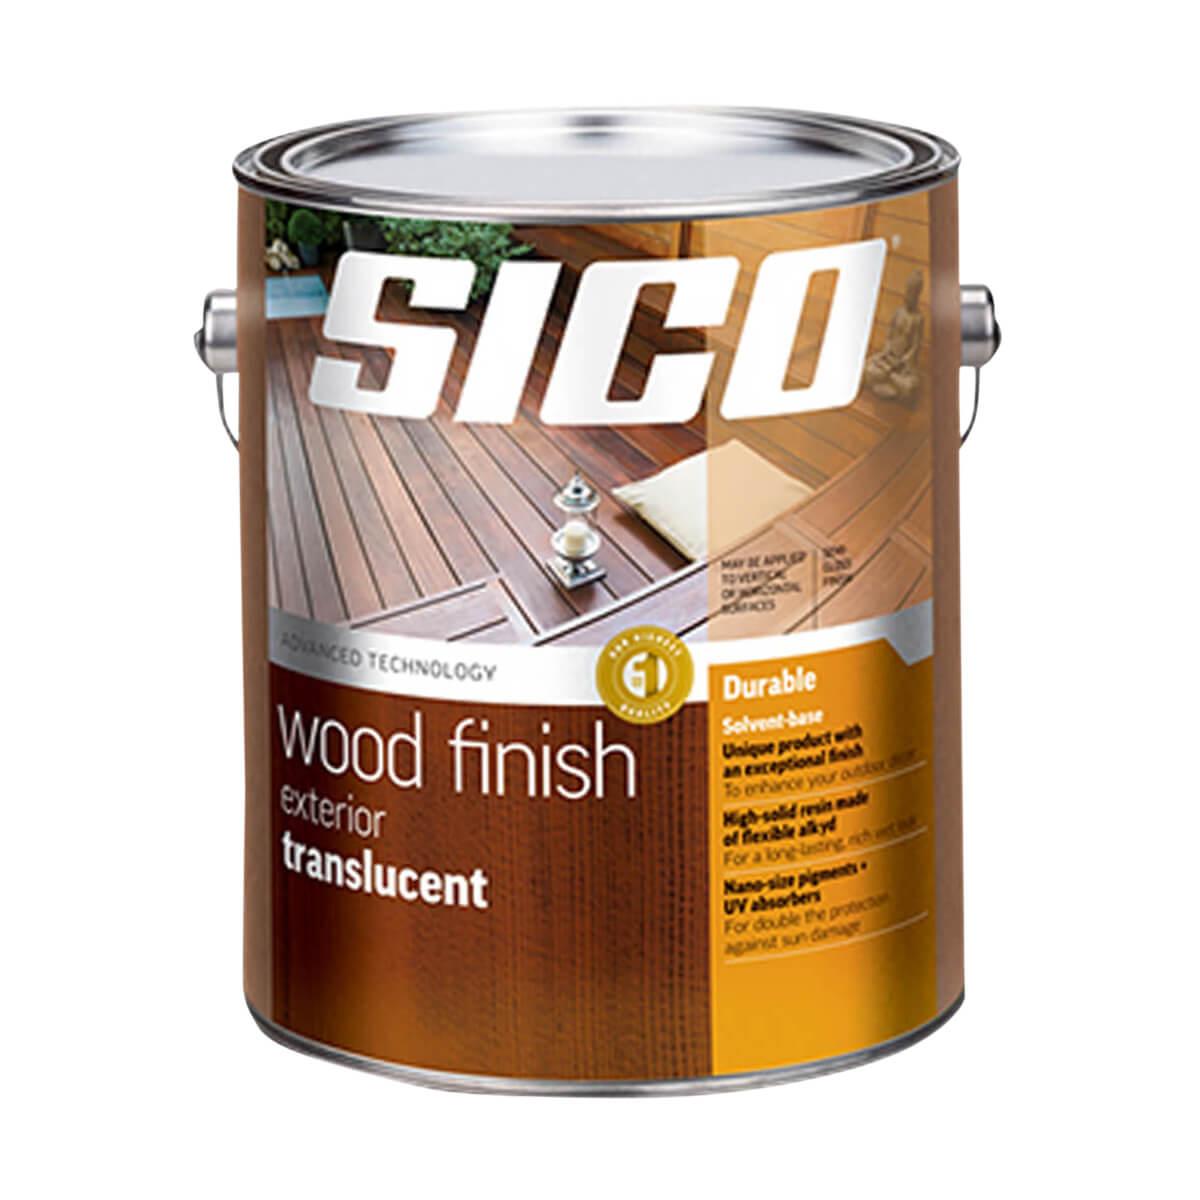 Sico Translucent Exterior Wood Finish - Series 236 - 3.78 L - Natural Oak